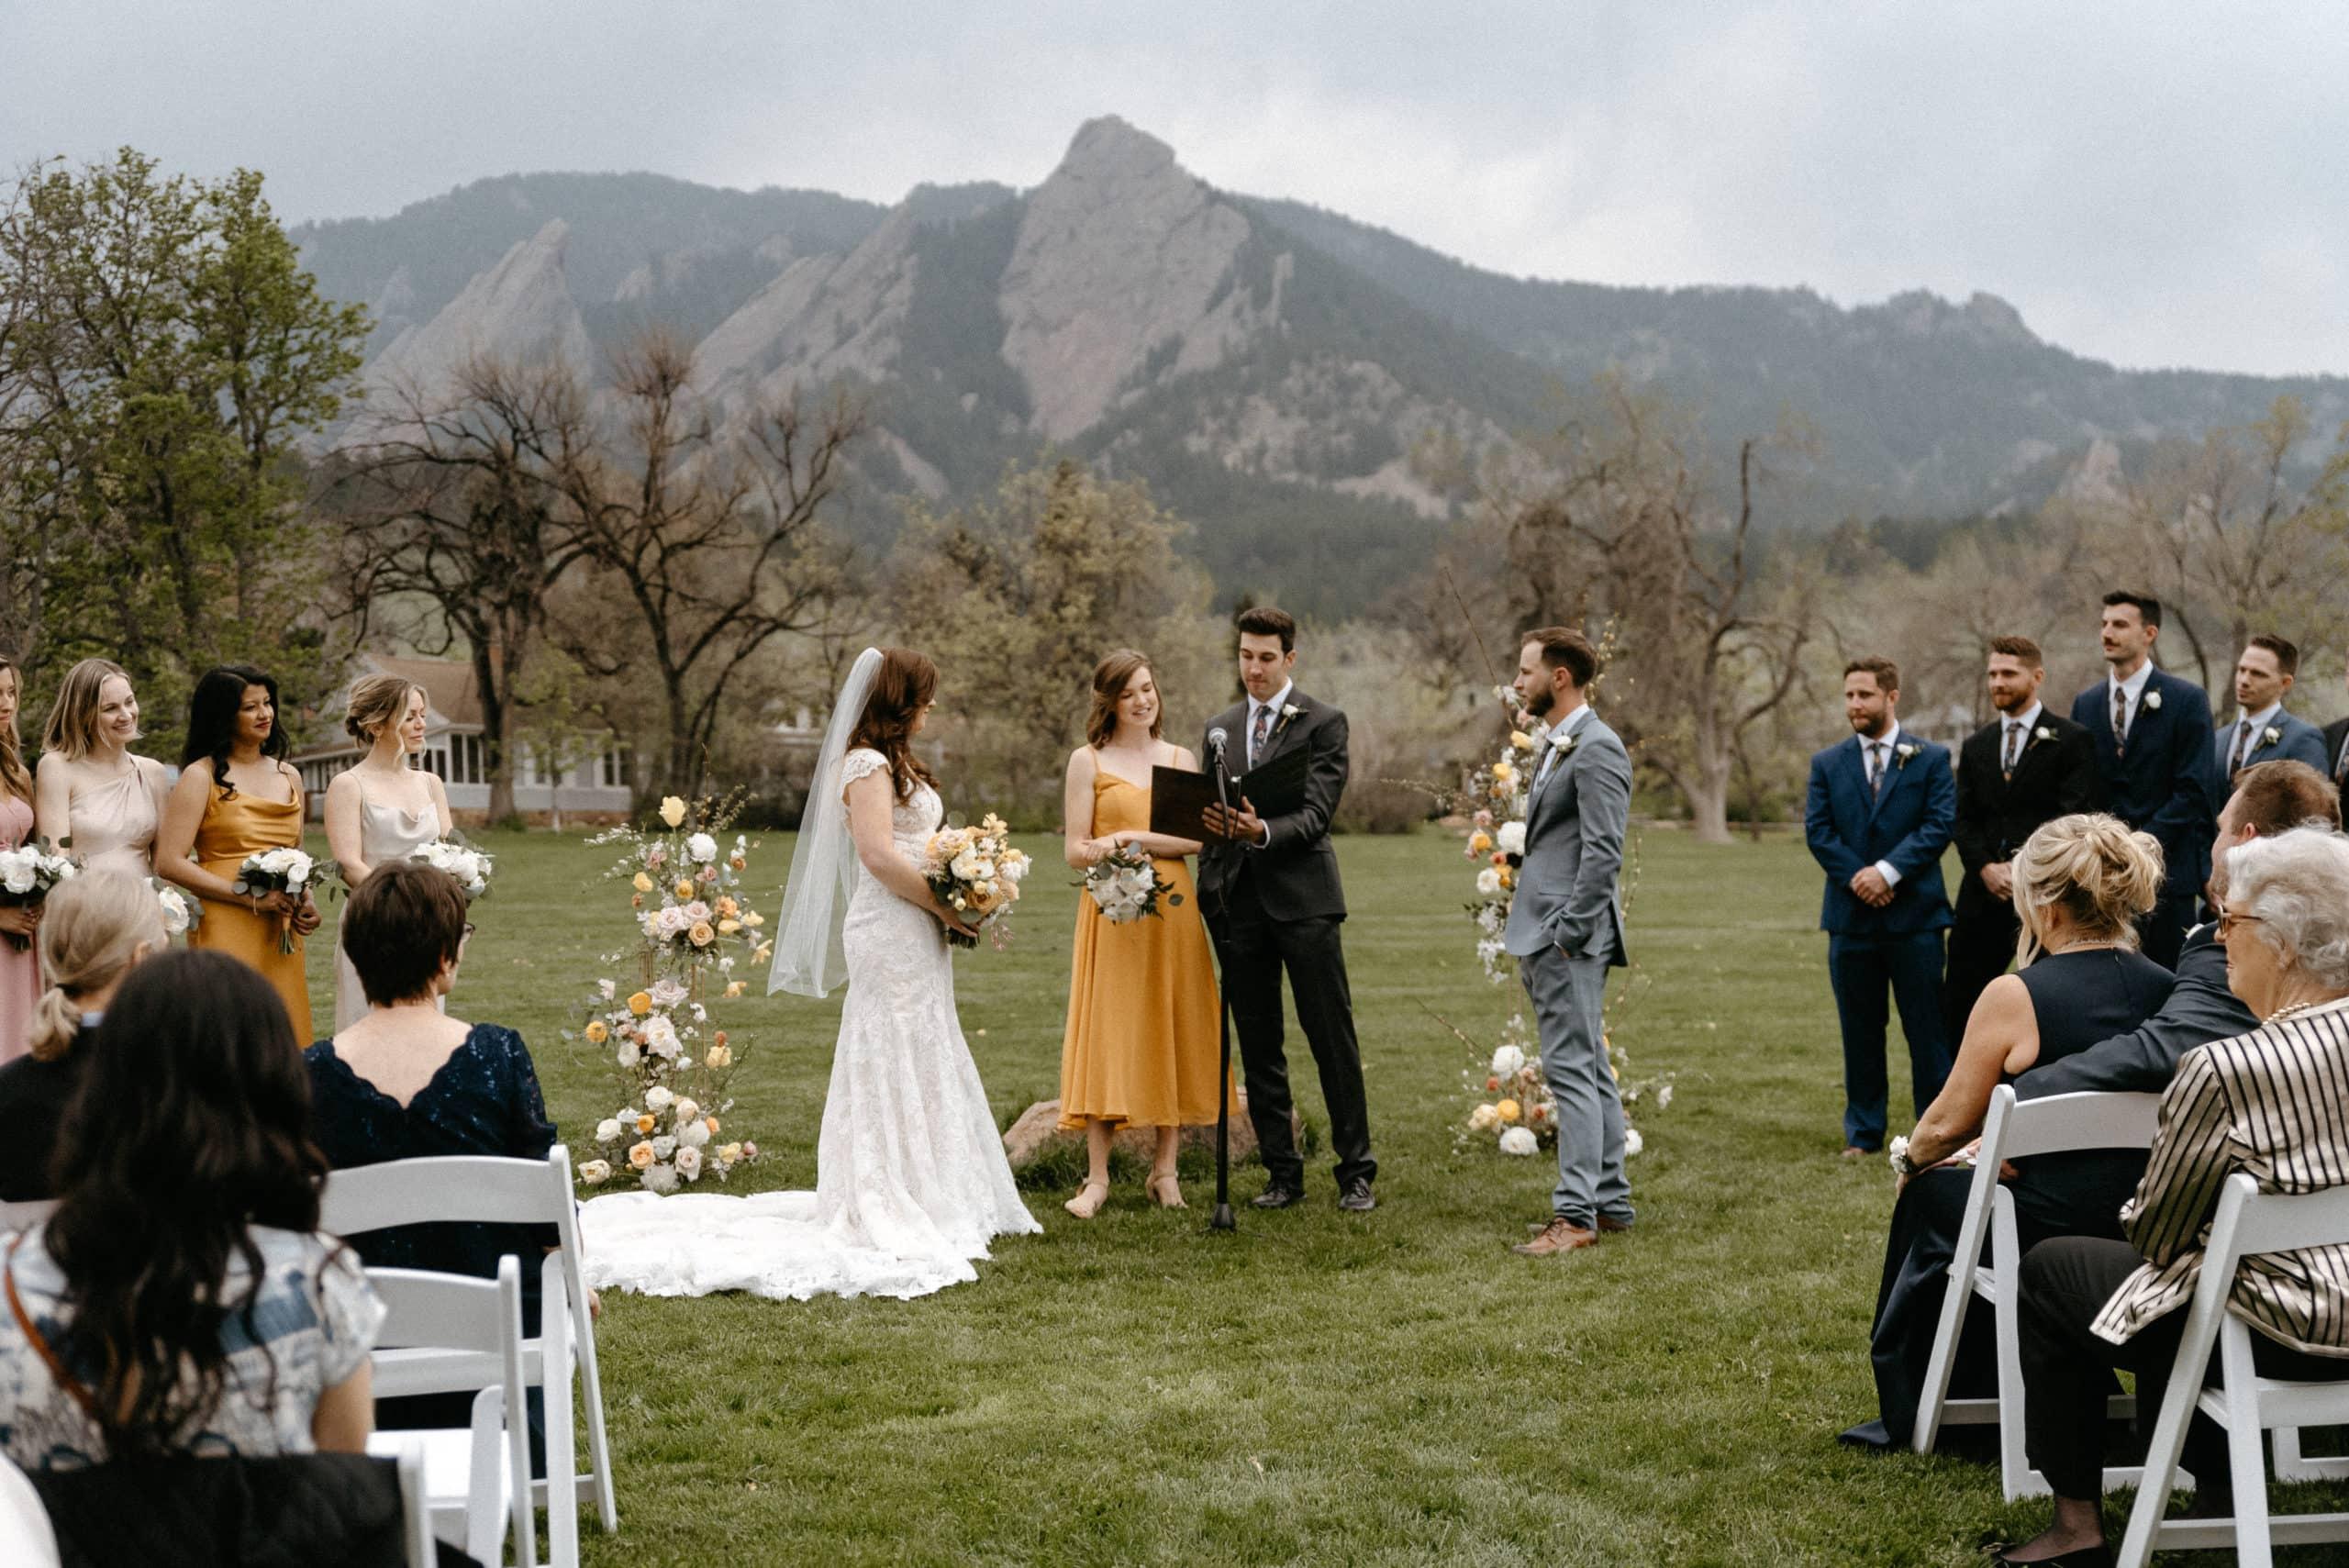 Chautauqua Park Wedding Location in Boulder